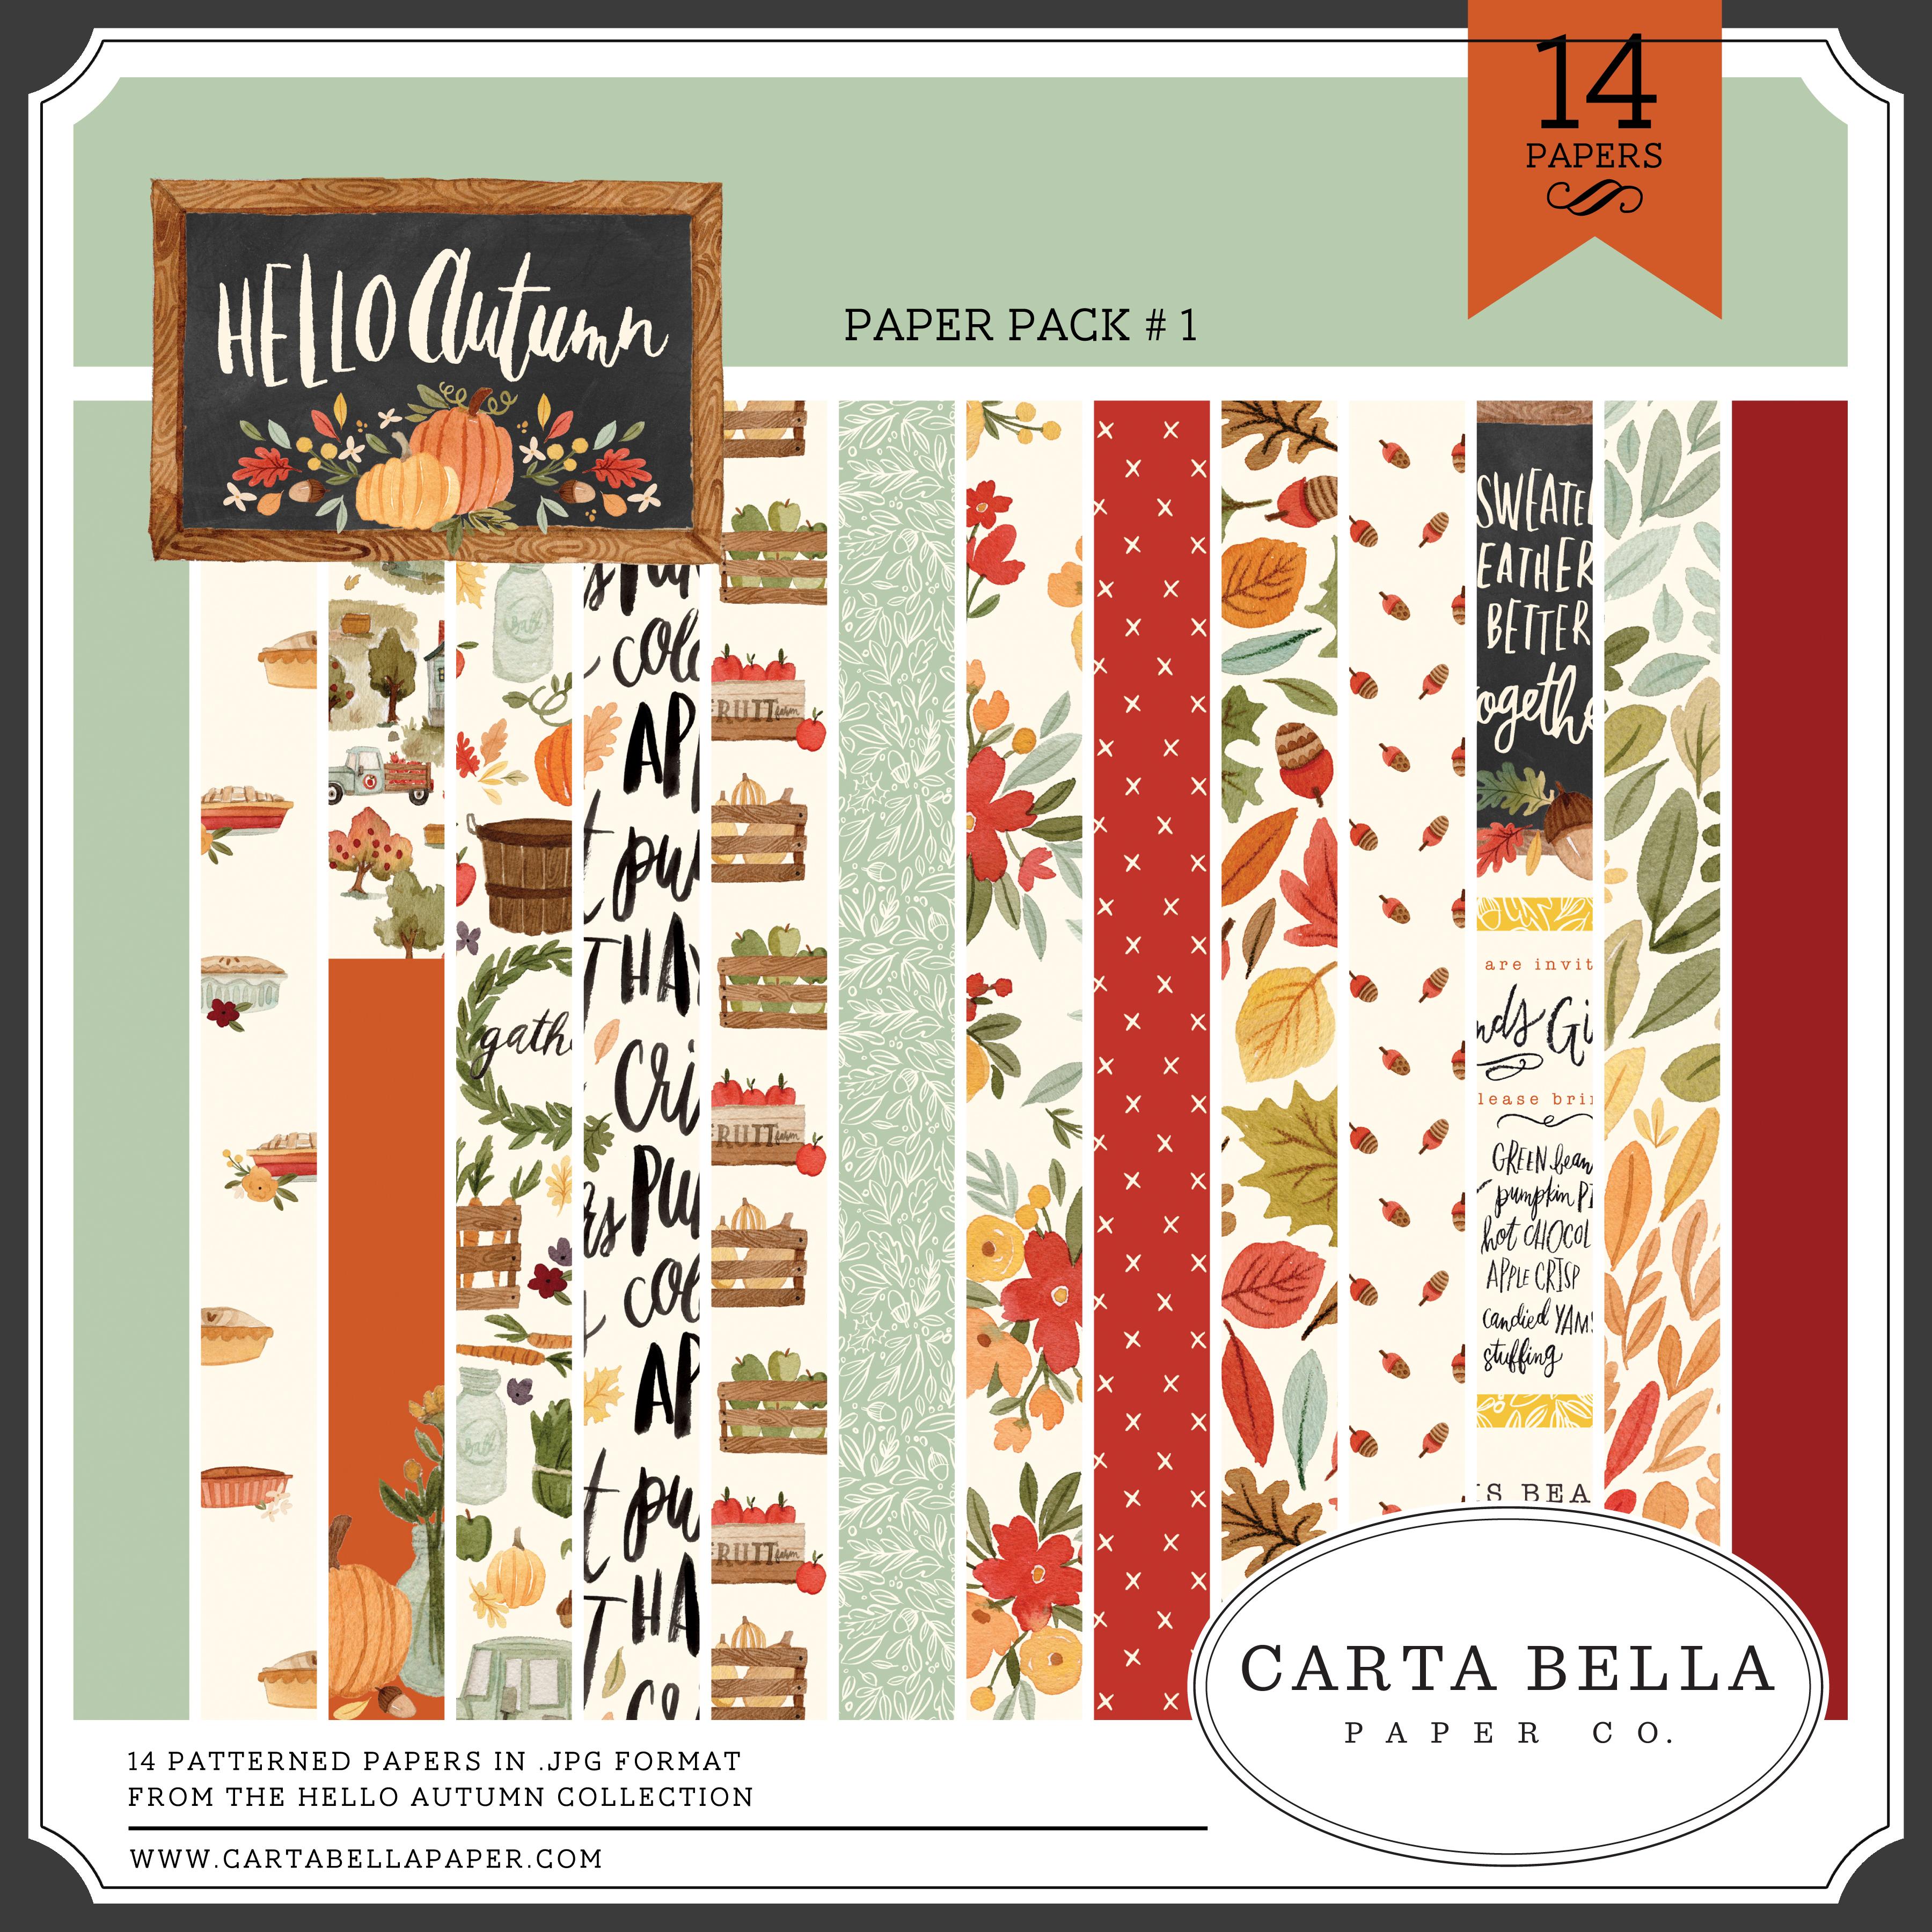 Hello Autumn Paper Pack #1